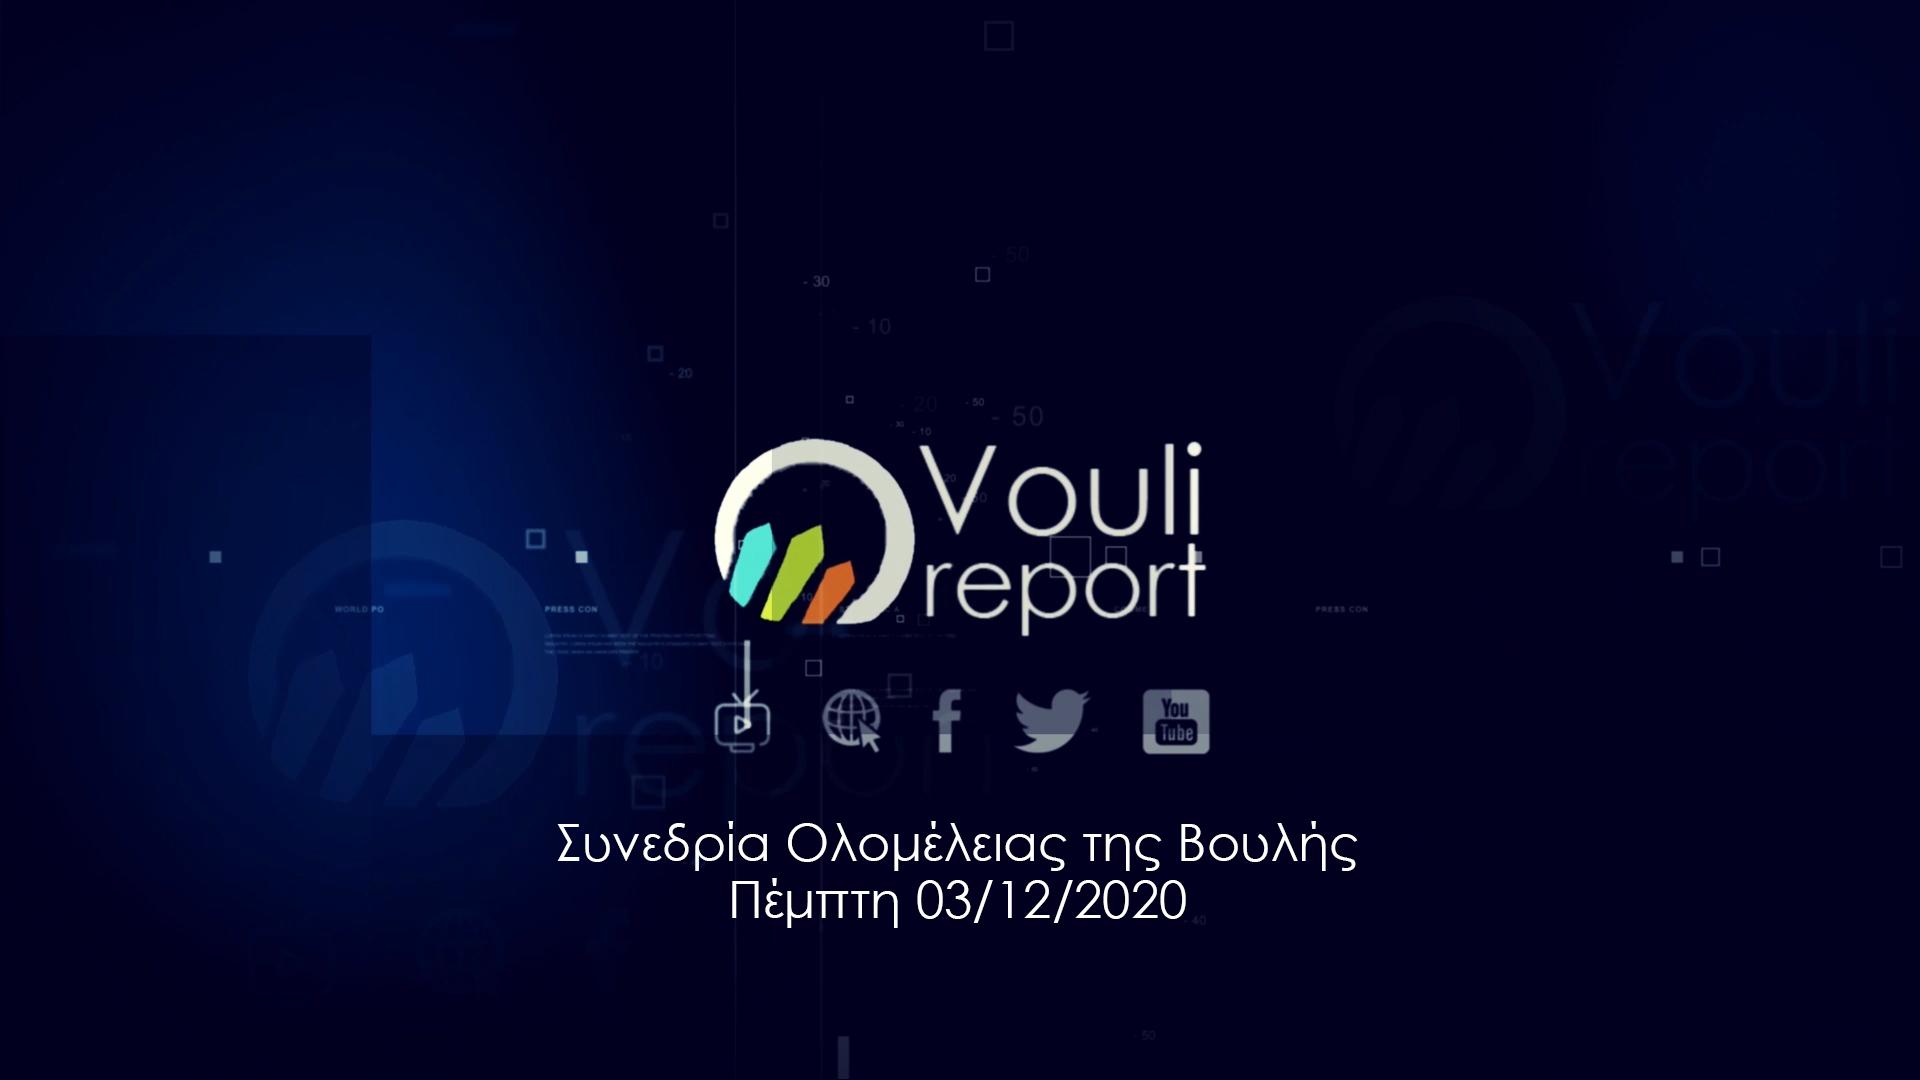 Vouli report   Συνεδρία Ολομέλειας της Βουλής - Πέμπτη 03/12/2020